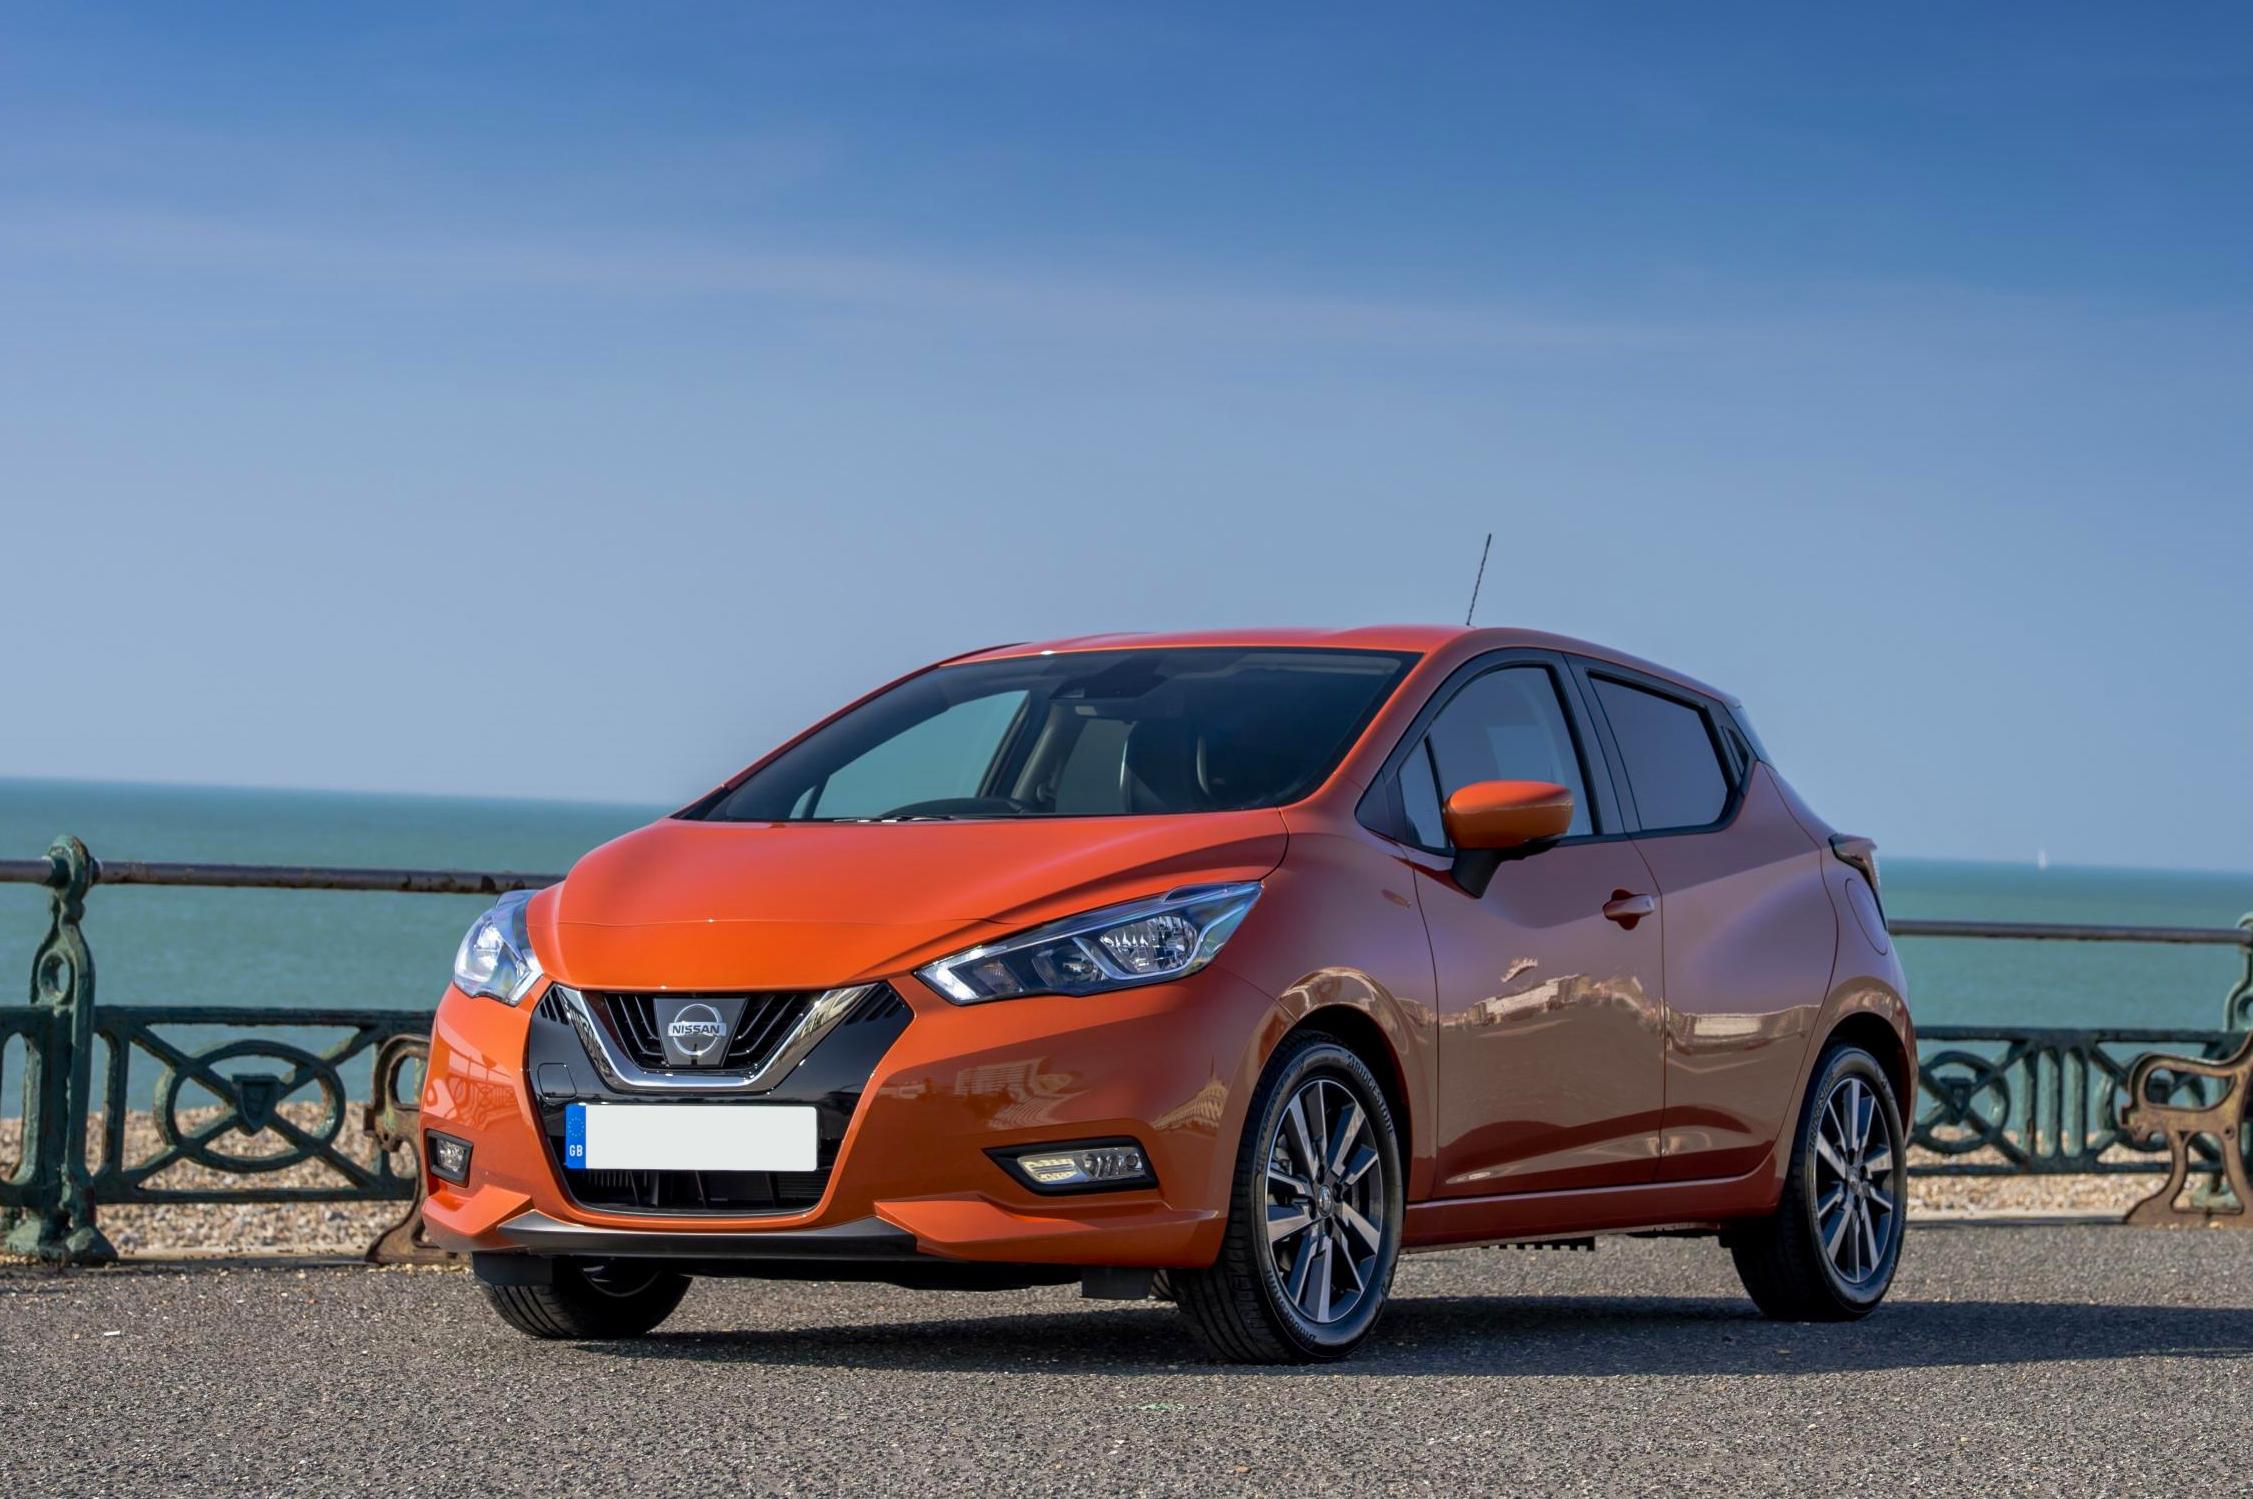 Nissan micra image.jpg (1.28 MB)